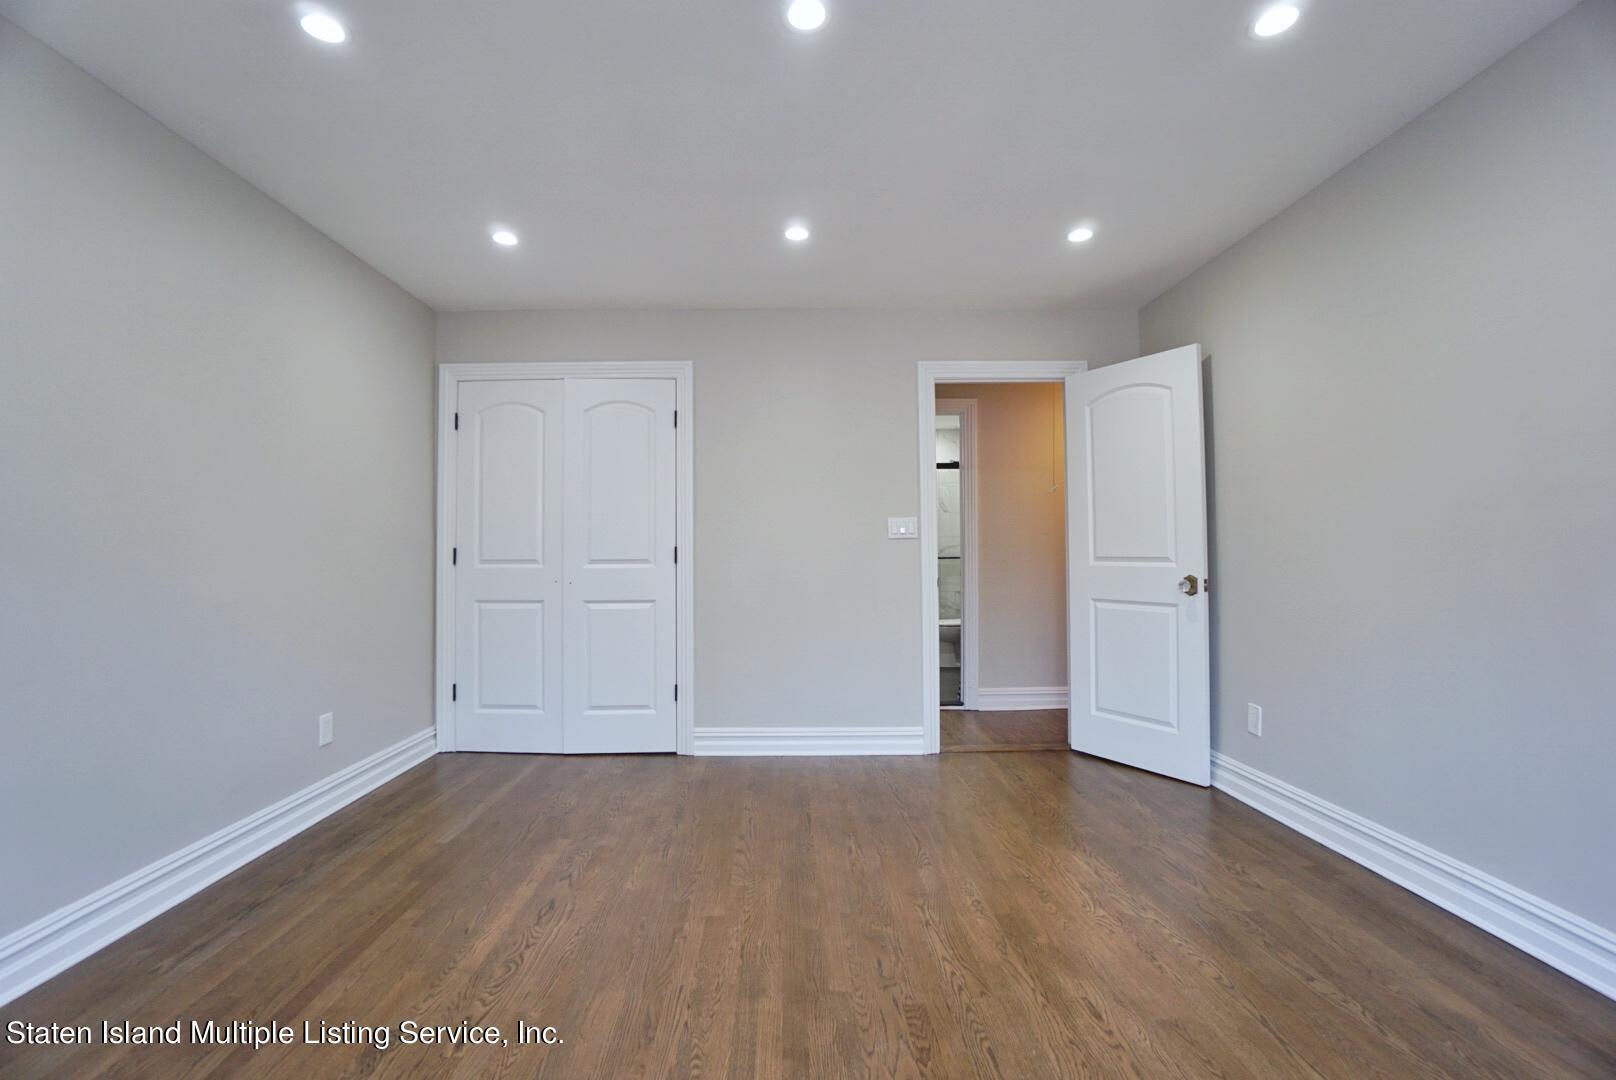 Single Family - Detached 116 Fine Blvd   Staten Island, NY 10314, MLS-1148291-55